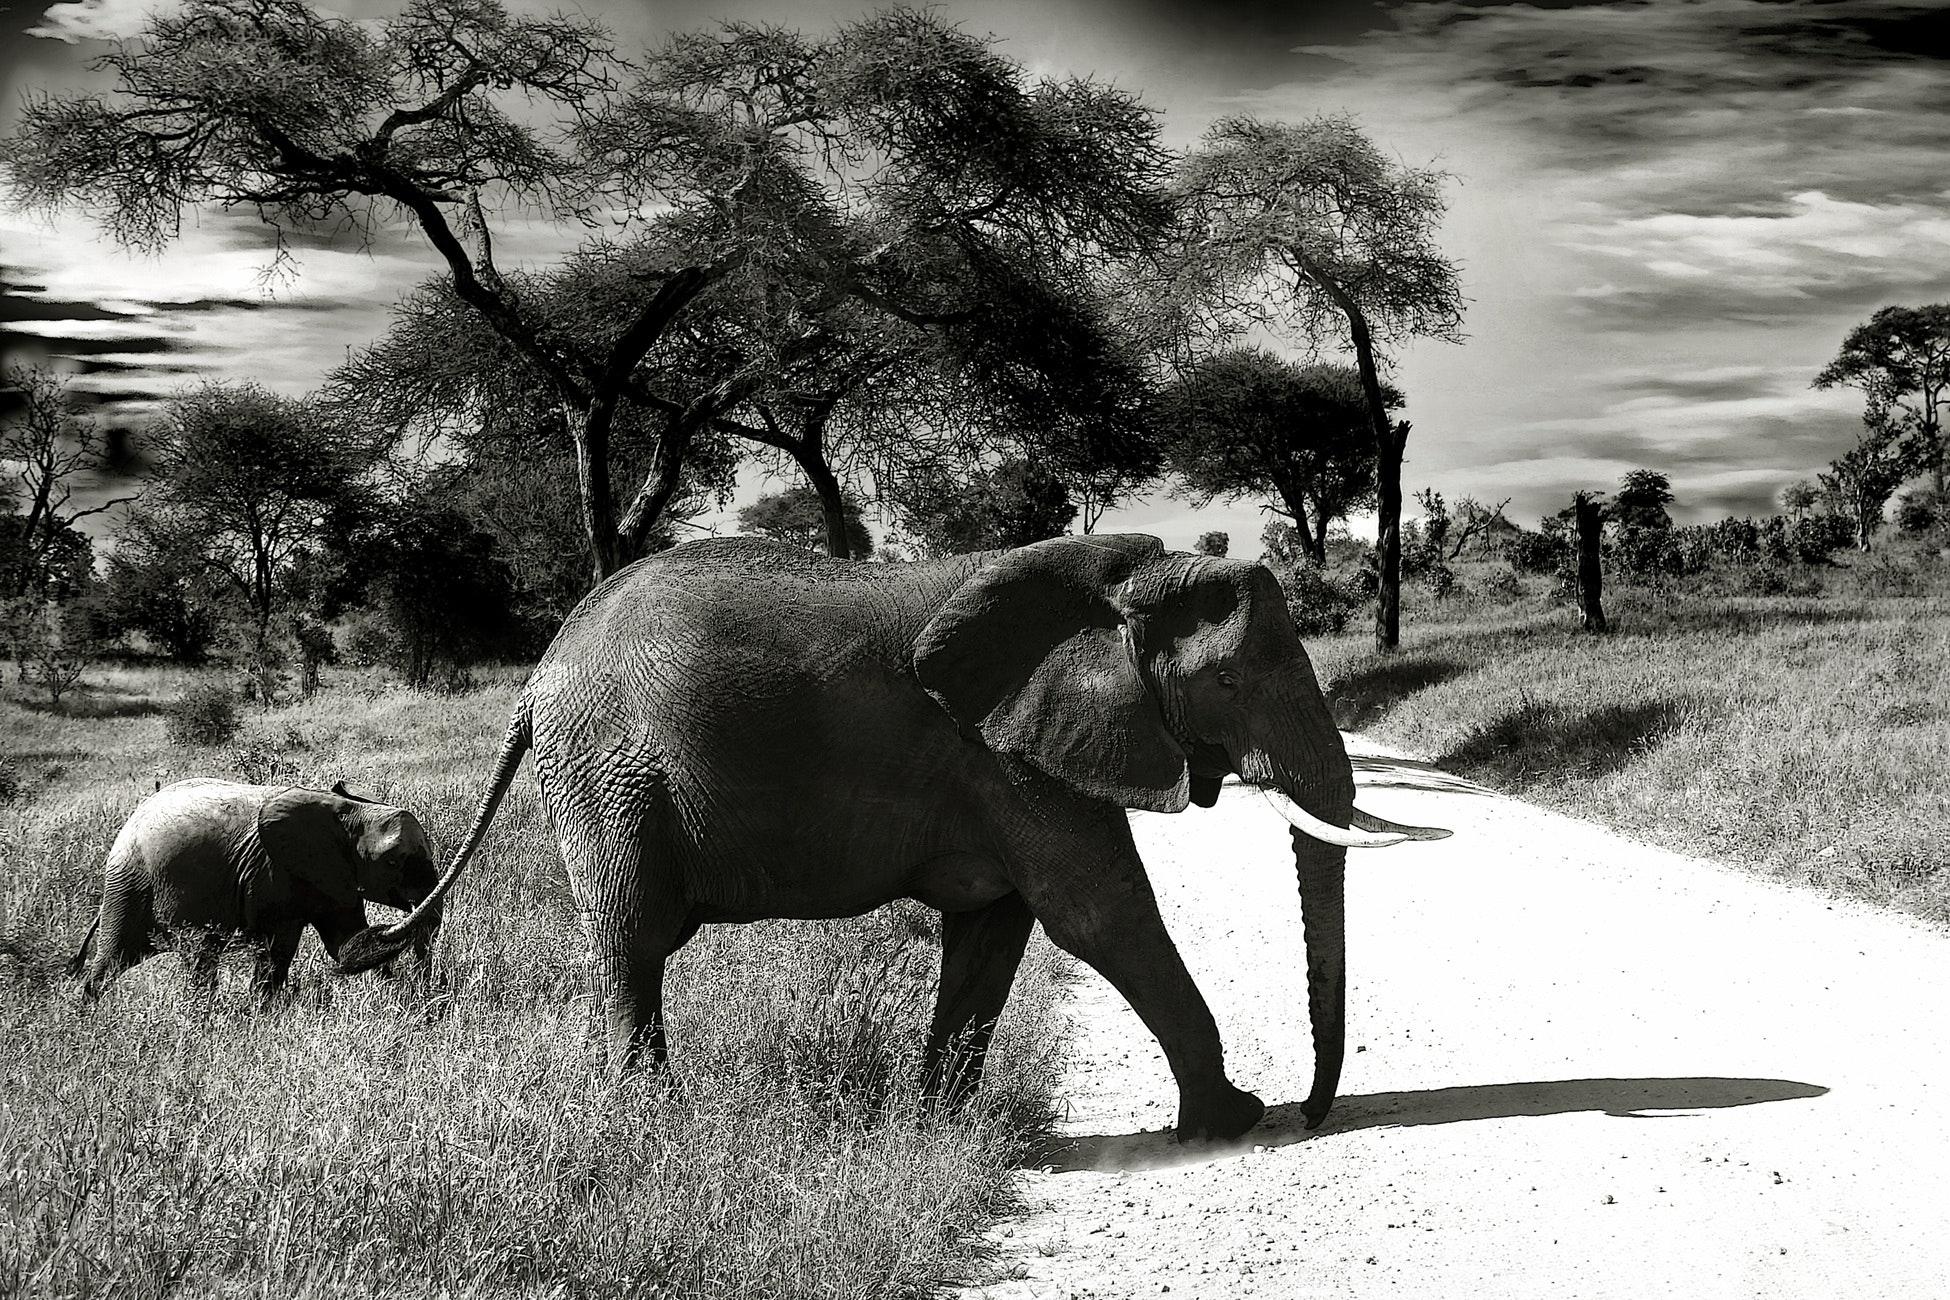 animals-black-and-white-elephants-37861.jpg